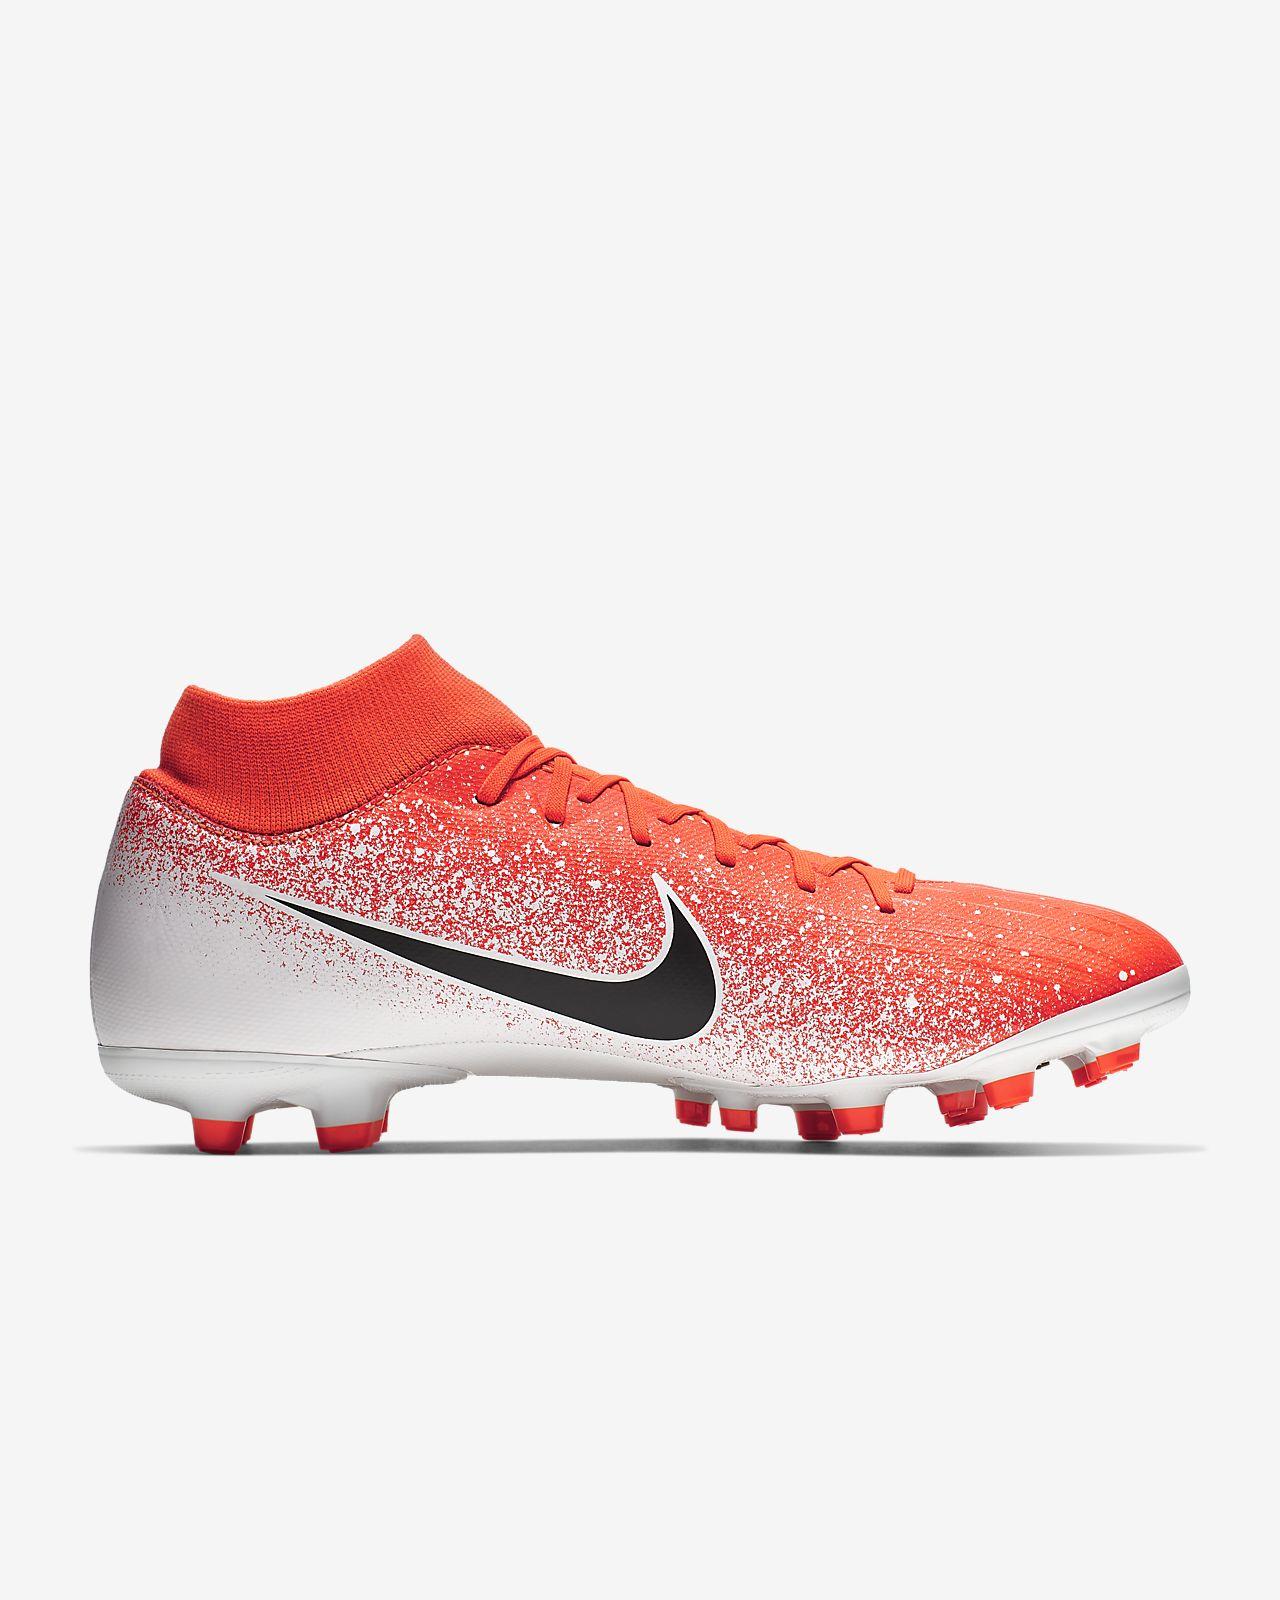 Chaussure de football multi terrains à crampons Nike Mercurial Superfly 6 Academy MG